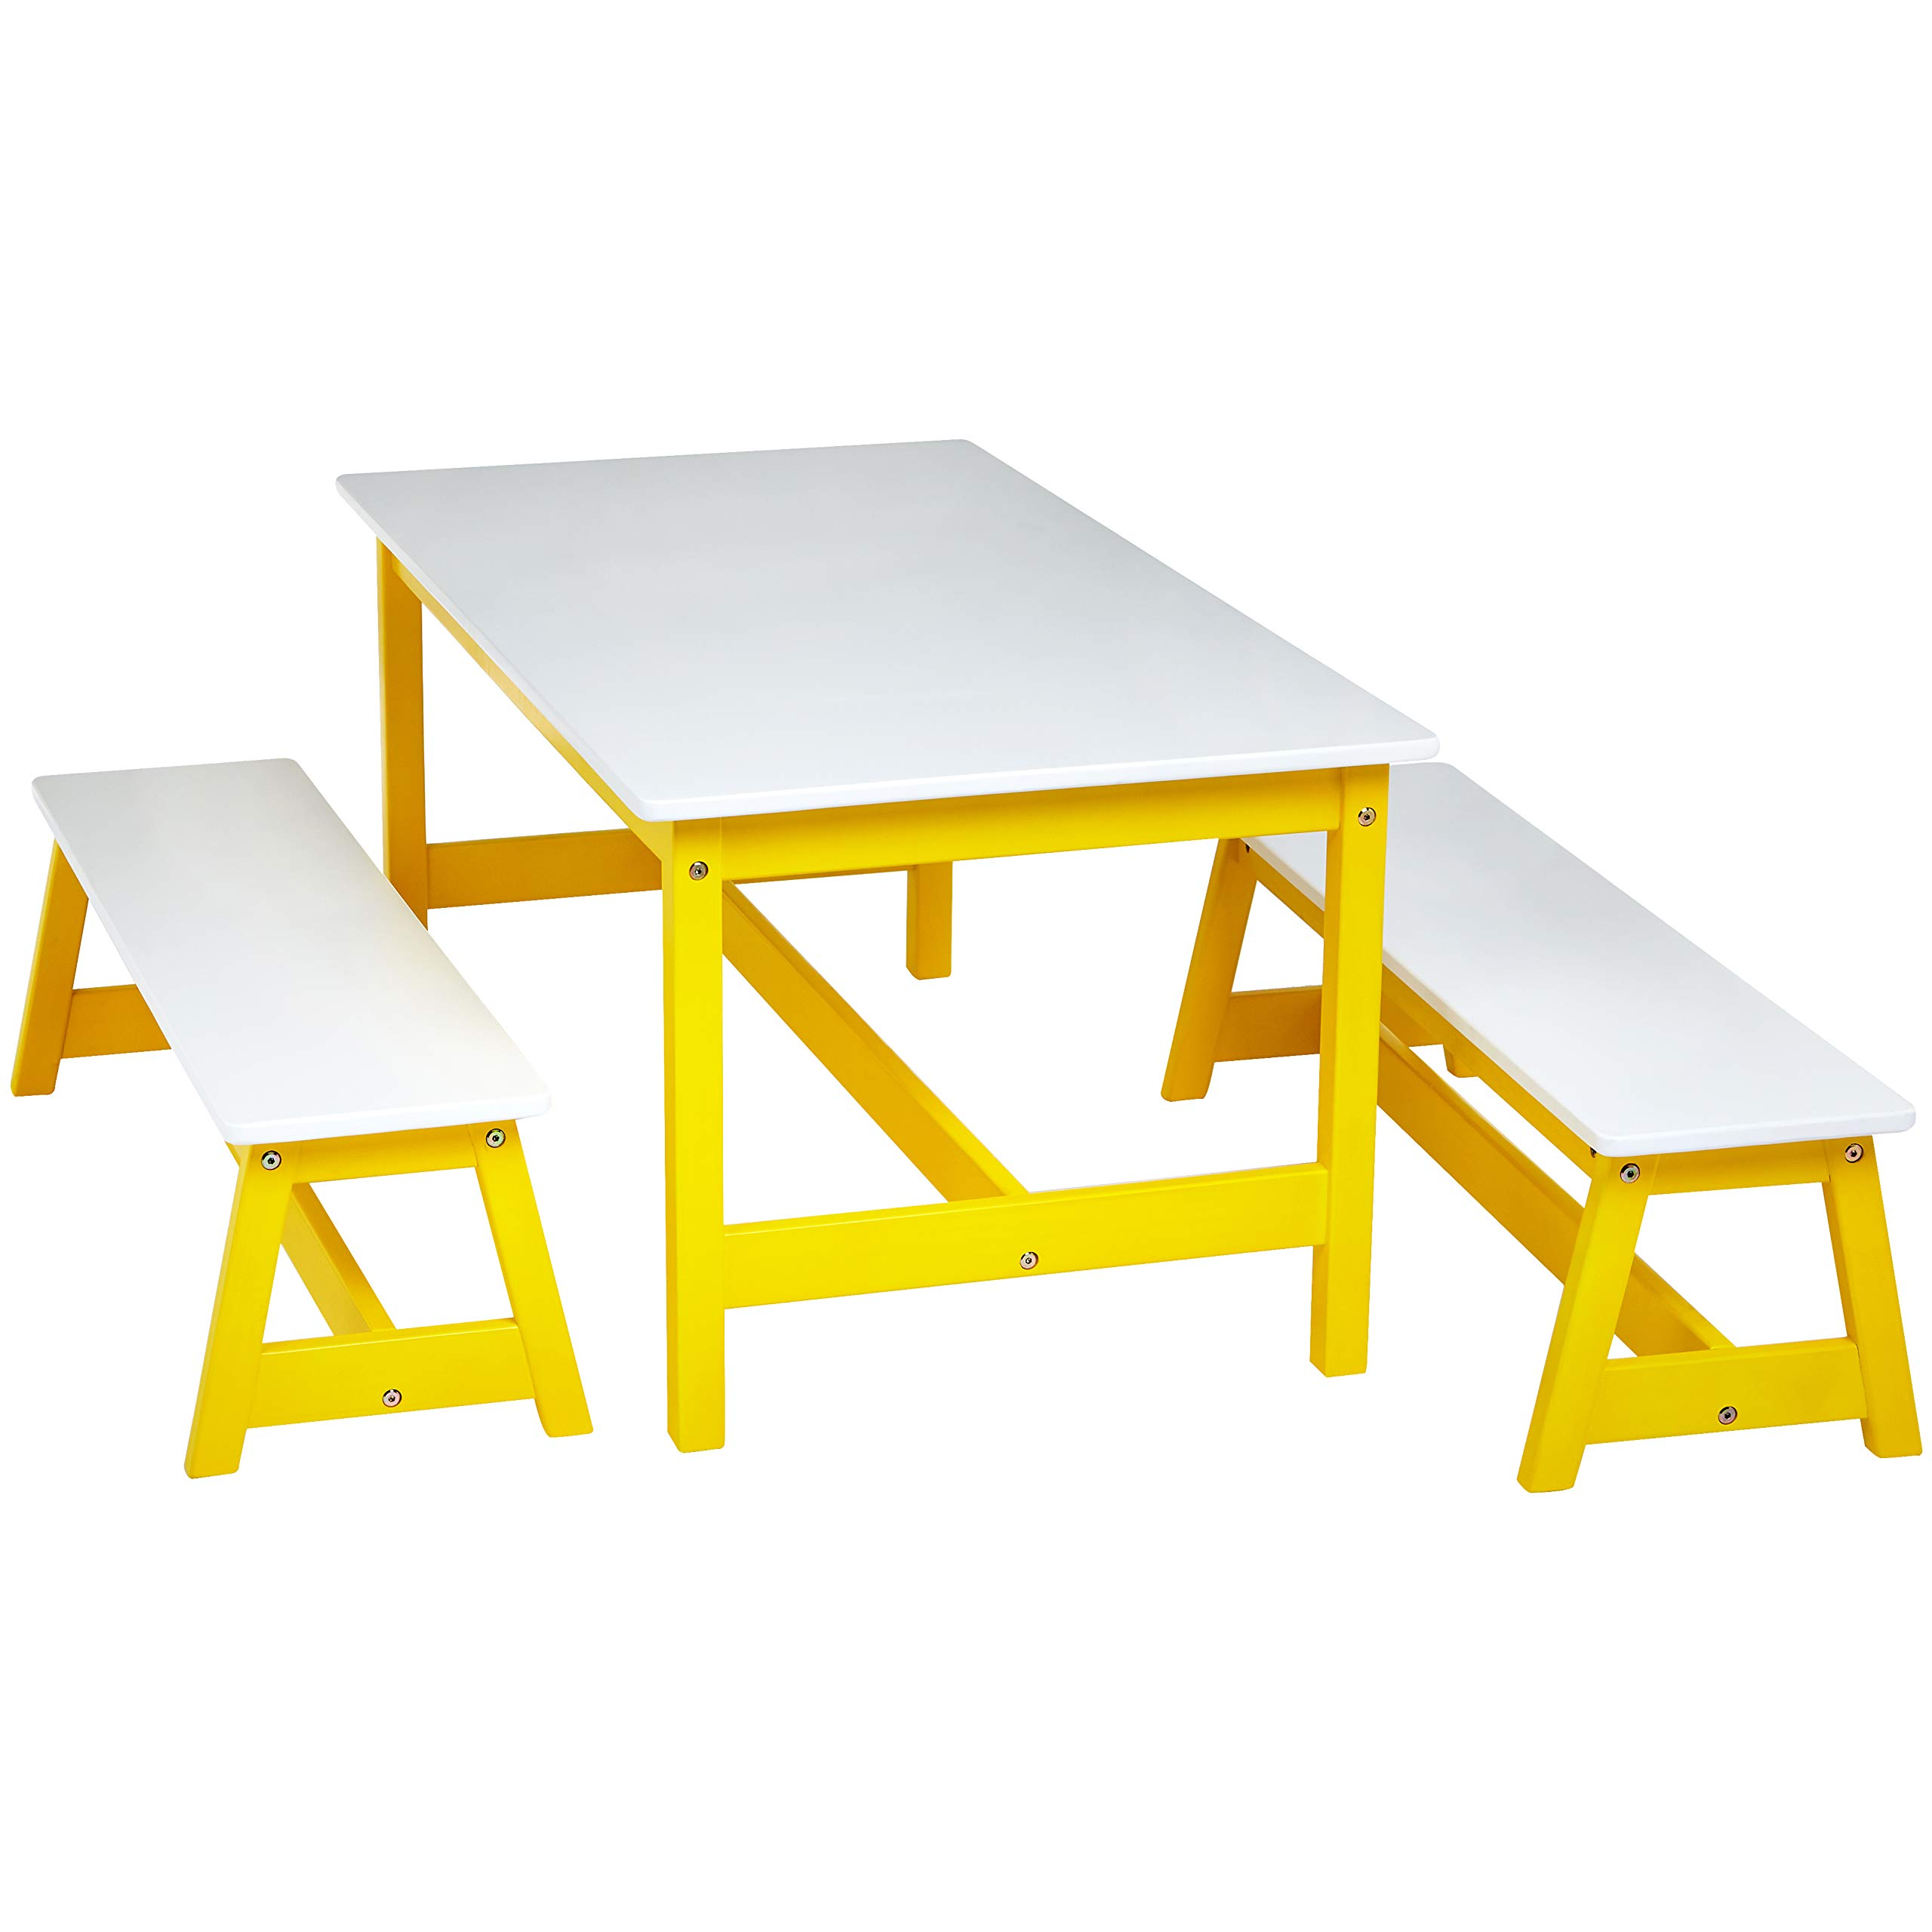 AmazonBasics Indoor Kids Table and Bench Set, White by AmazonBasics